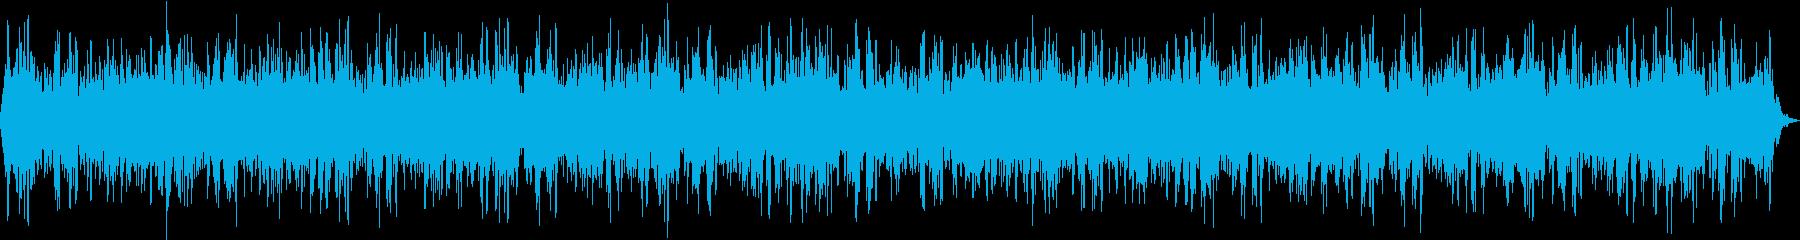 魔法詠唱、魔法発動、独白 04の再生済みの波形